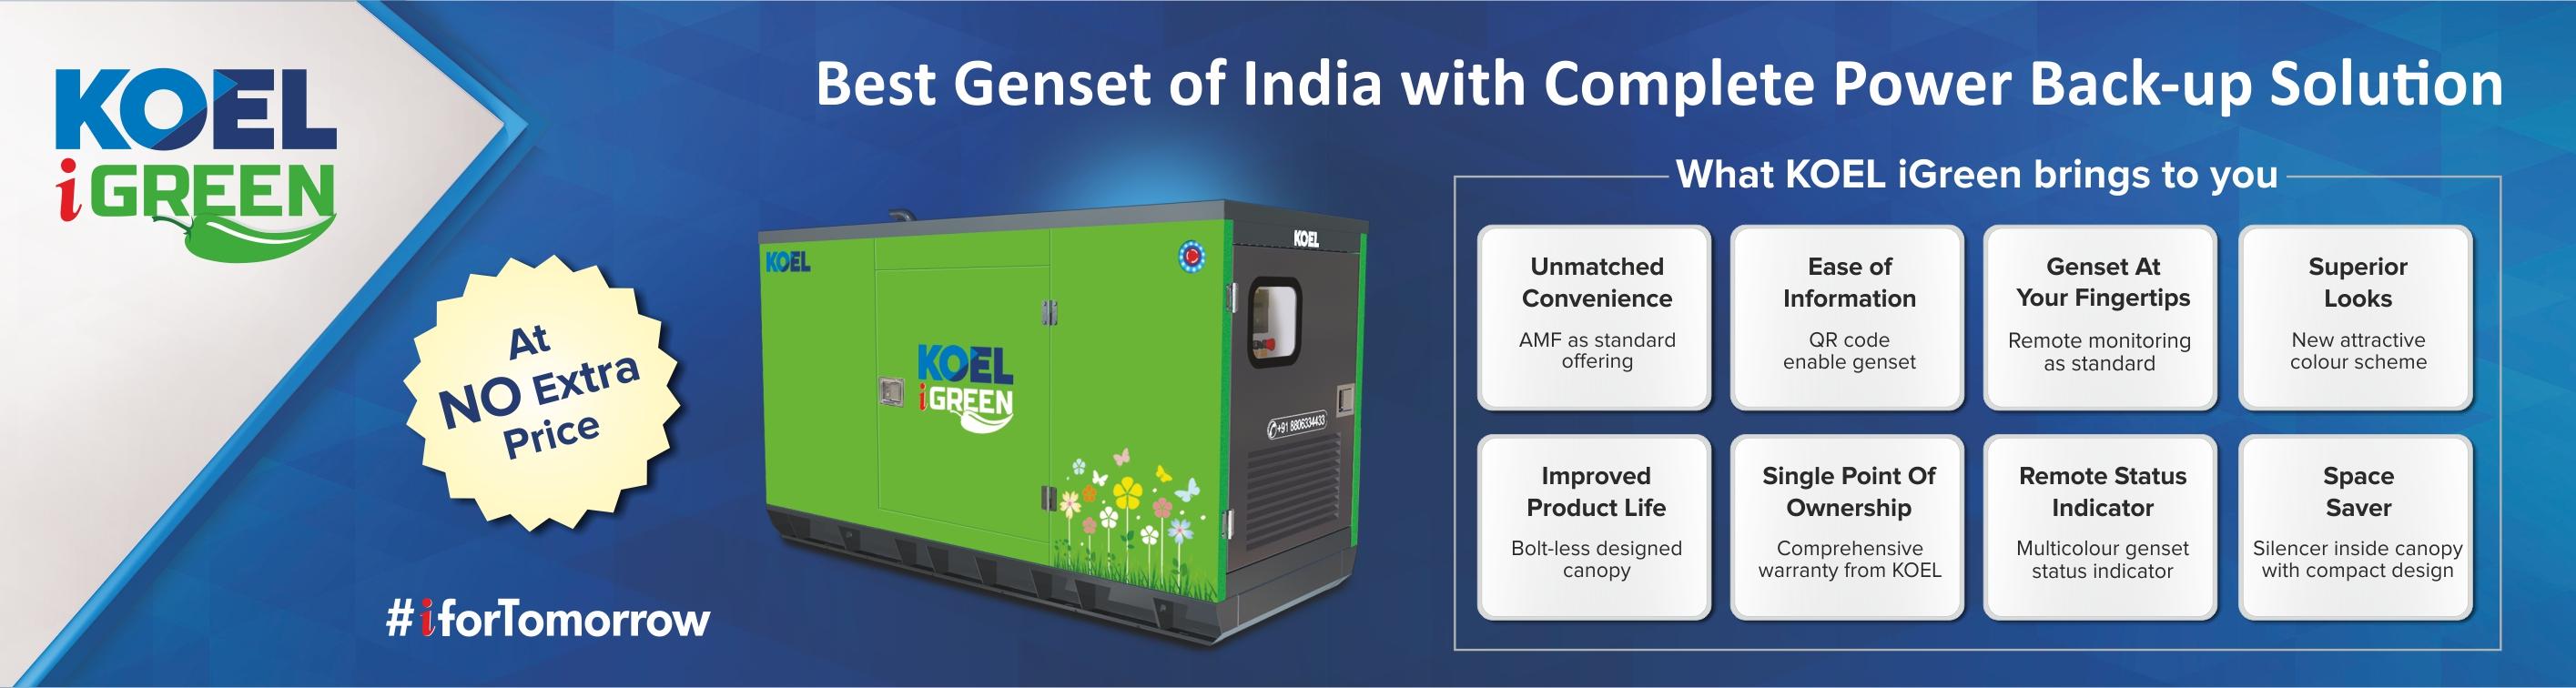 KOEL Generator Dealers in Chennai